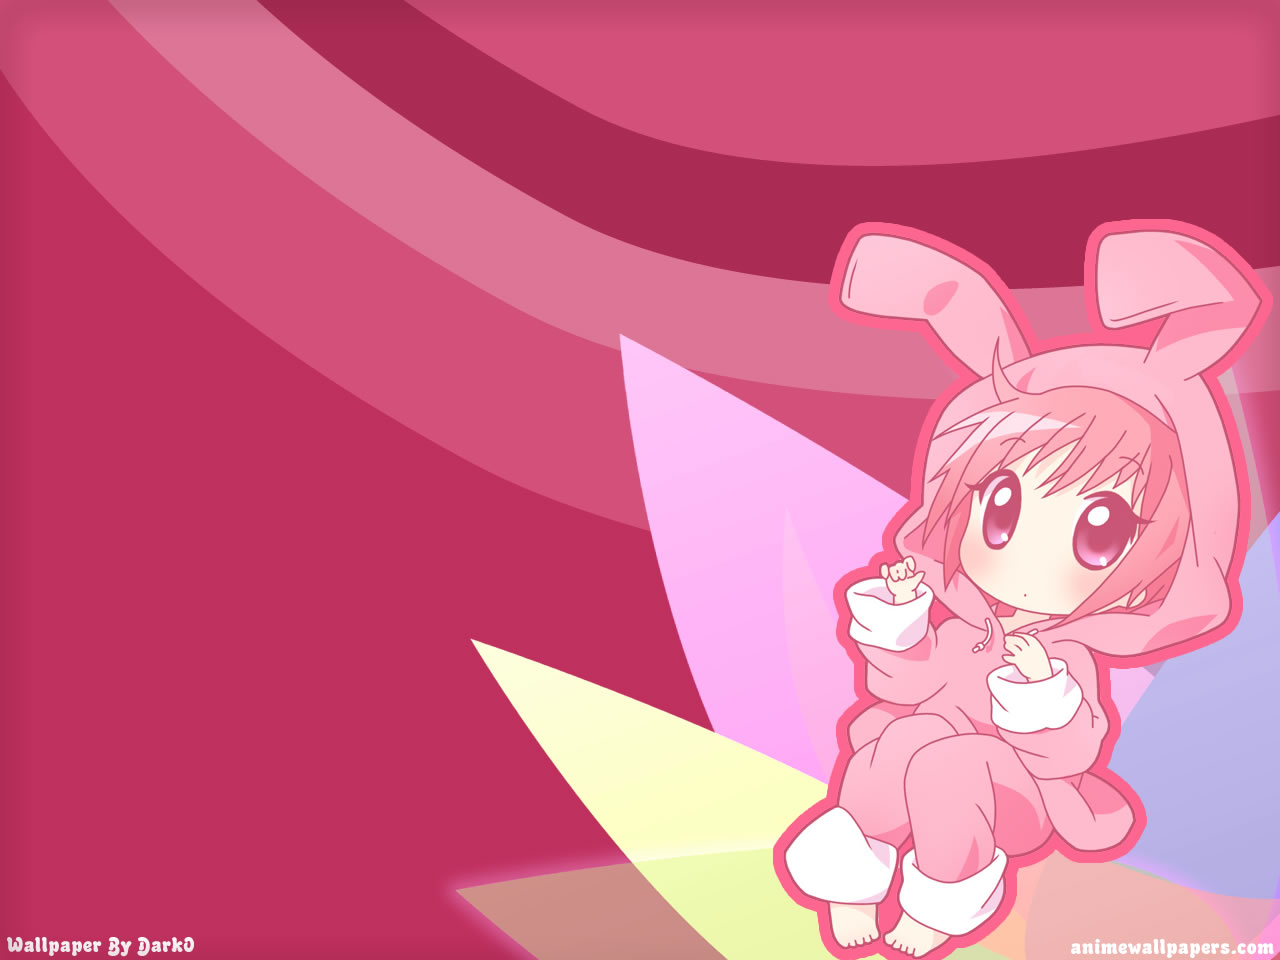 Miscellaneous Anime Wallpaper # 123